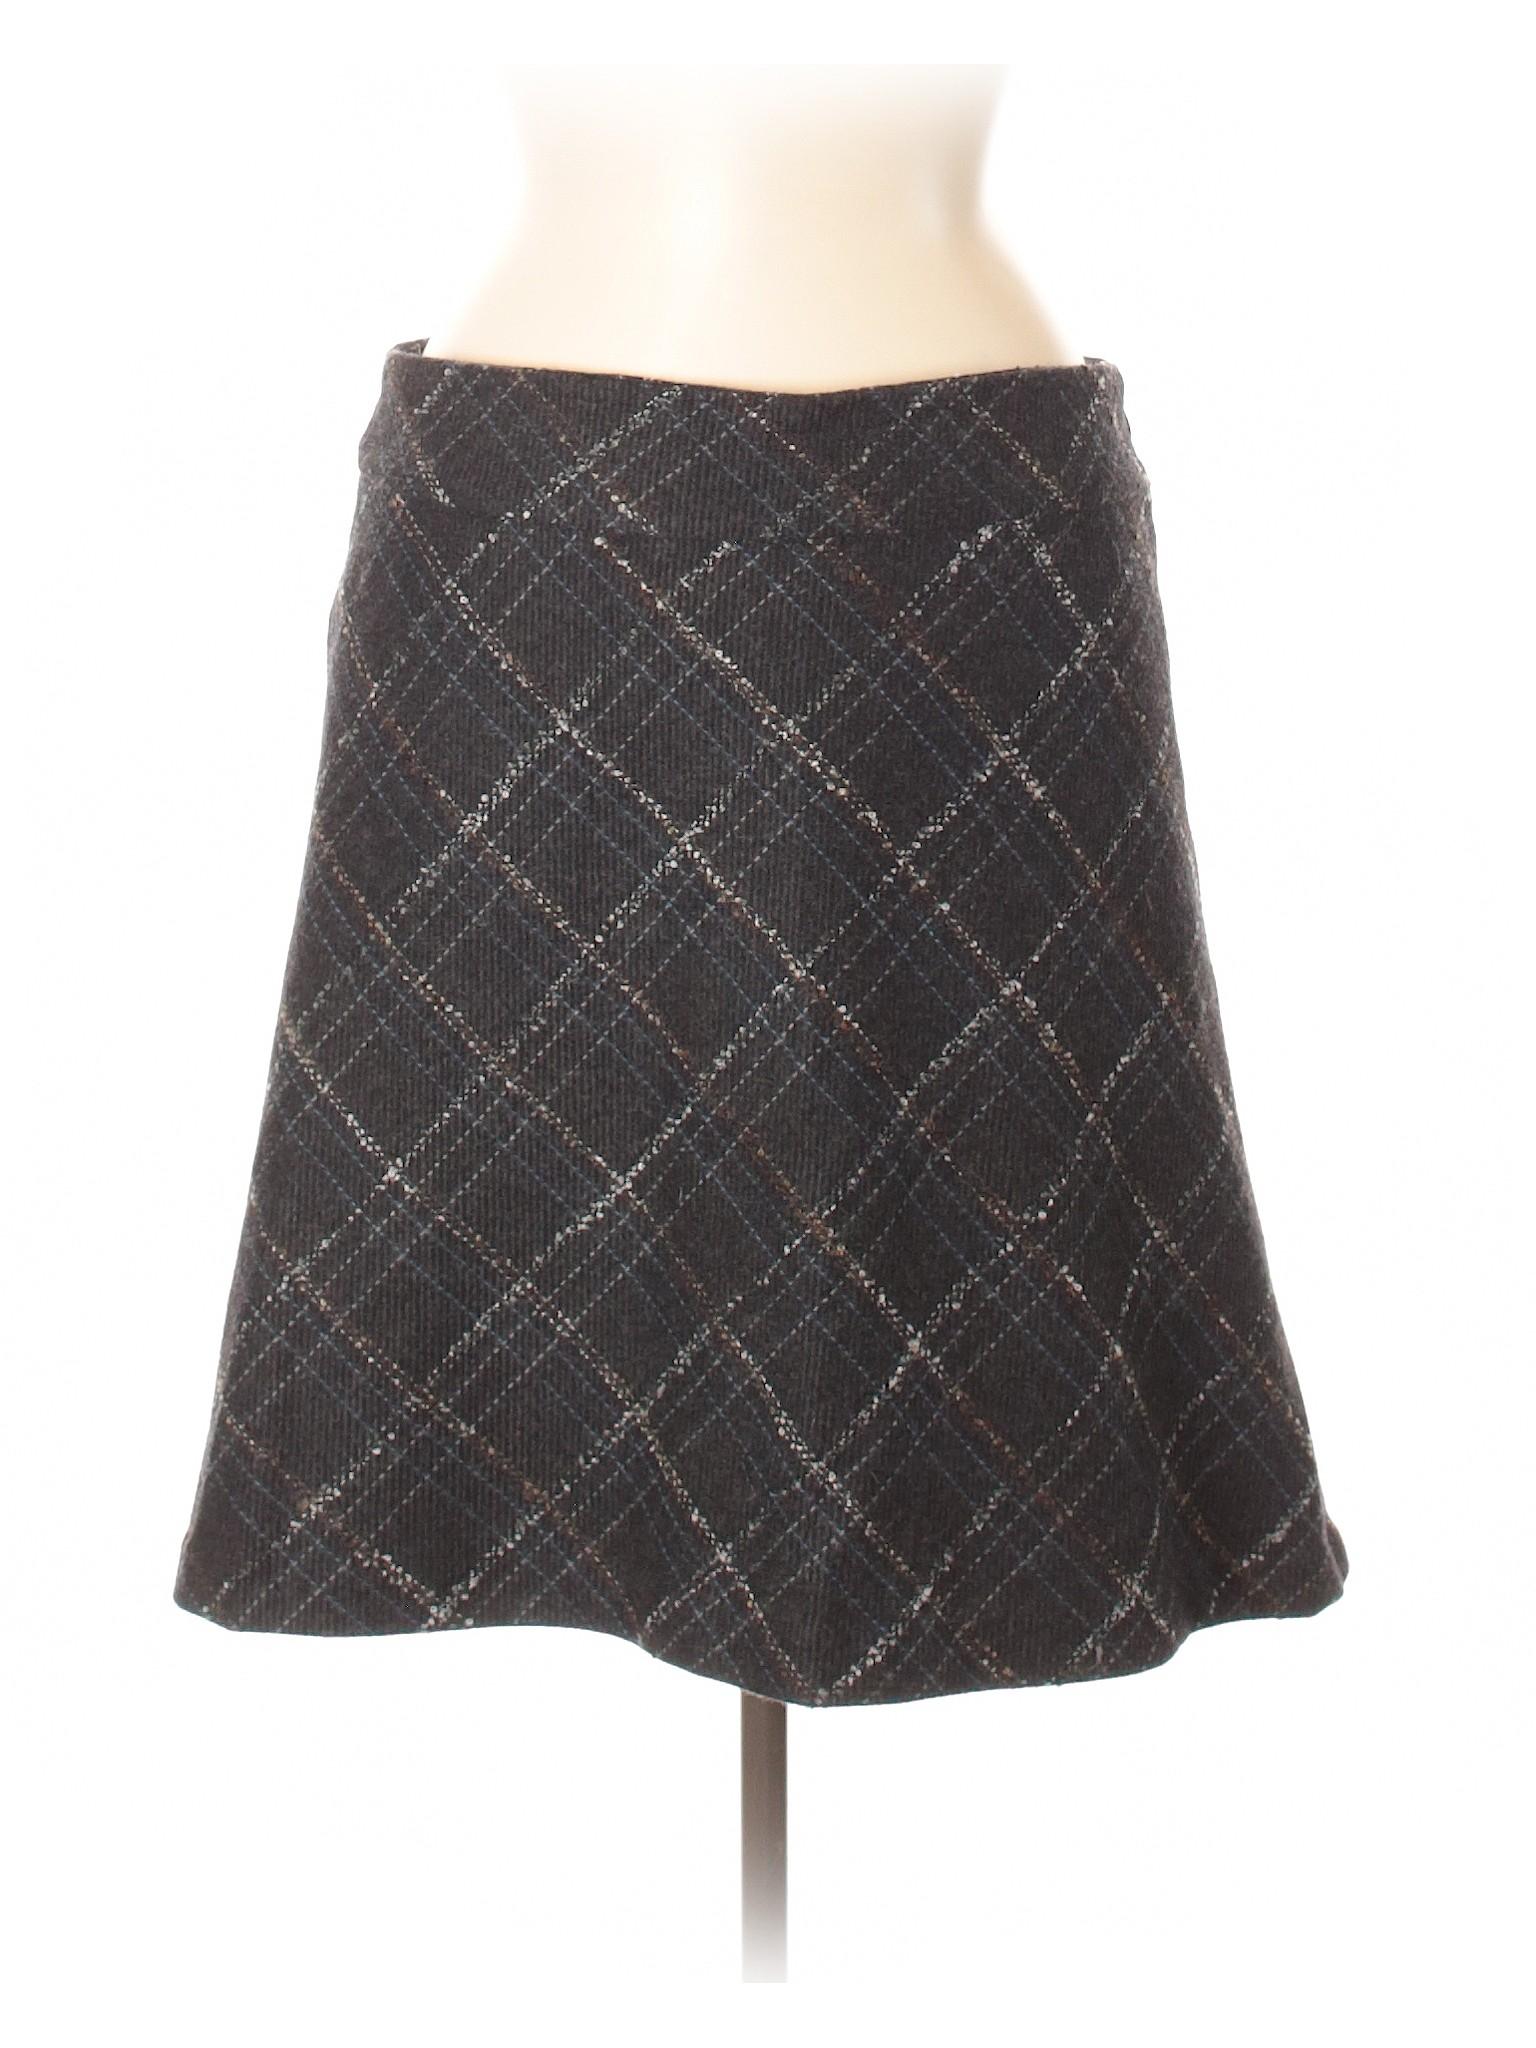 Wool Skirt Boutique Boutique Wool 1w74qnXzE